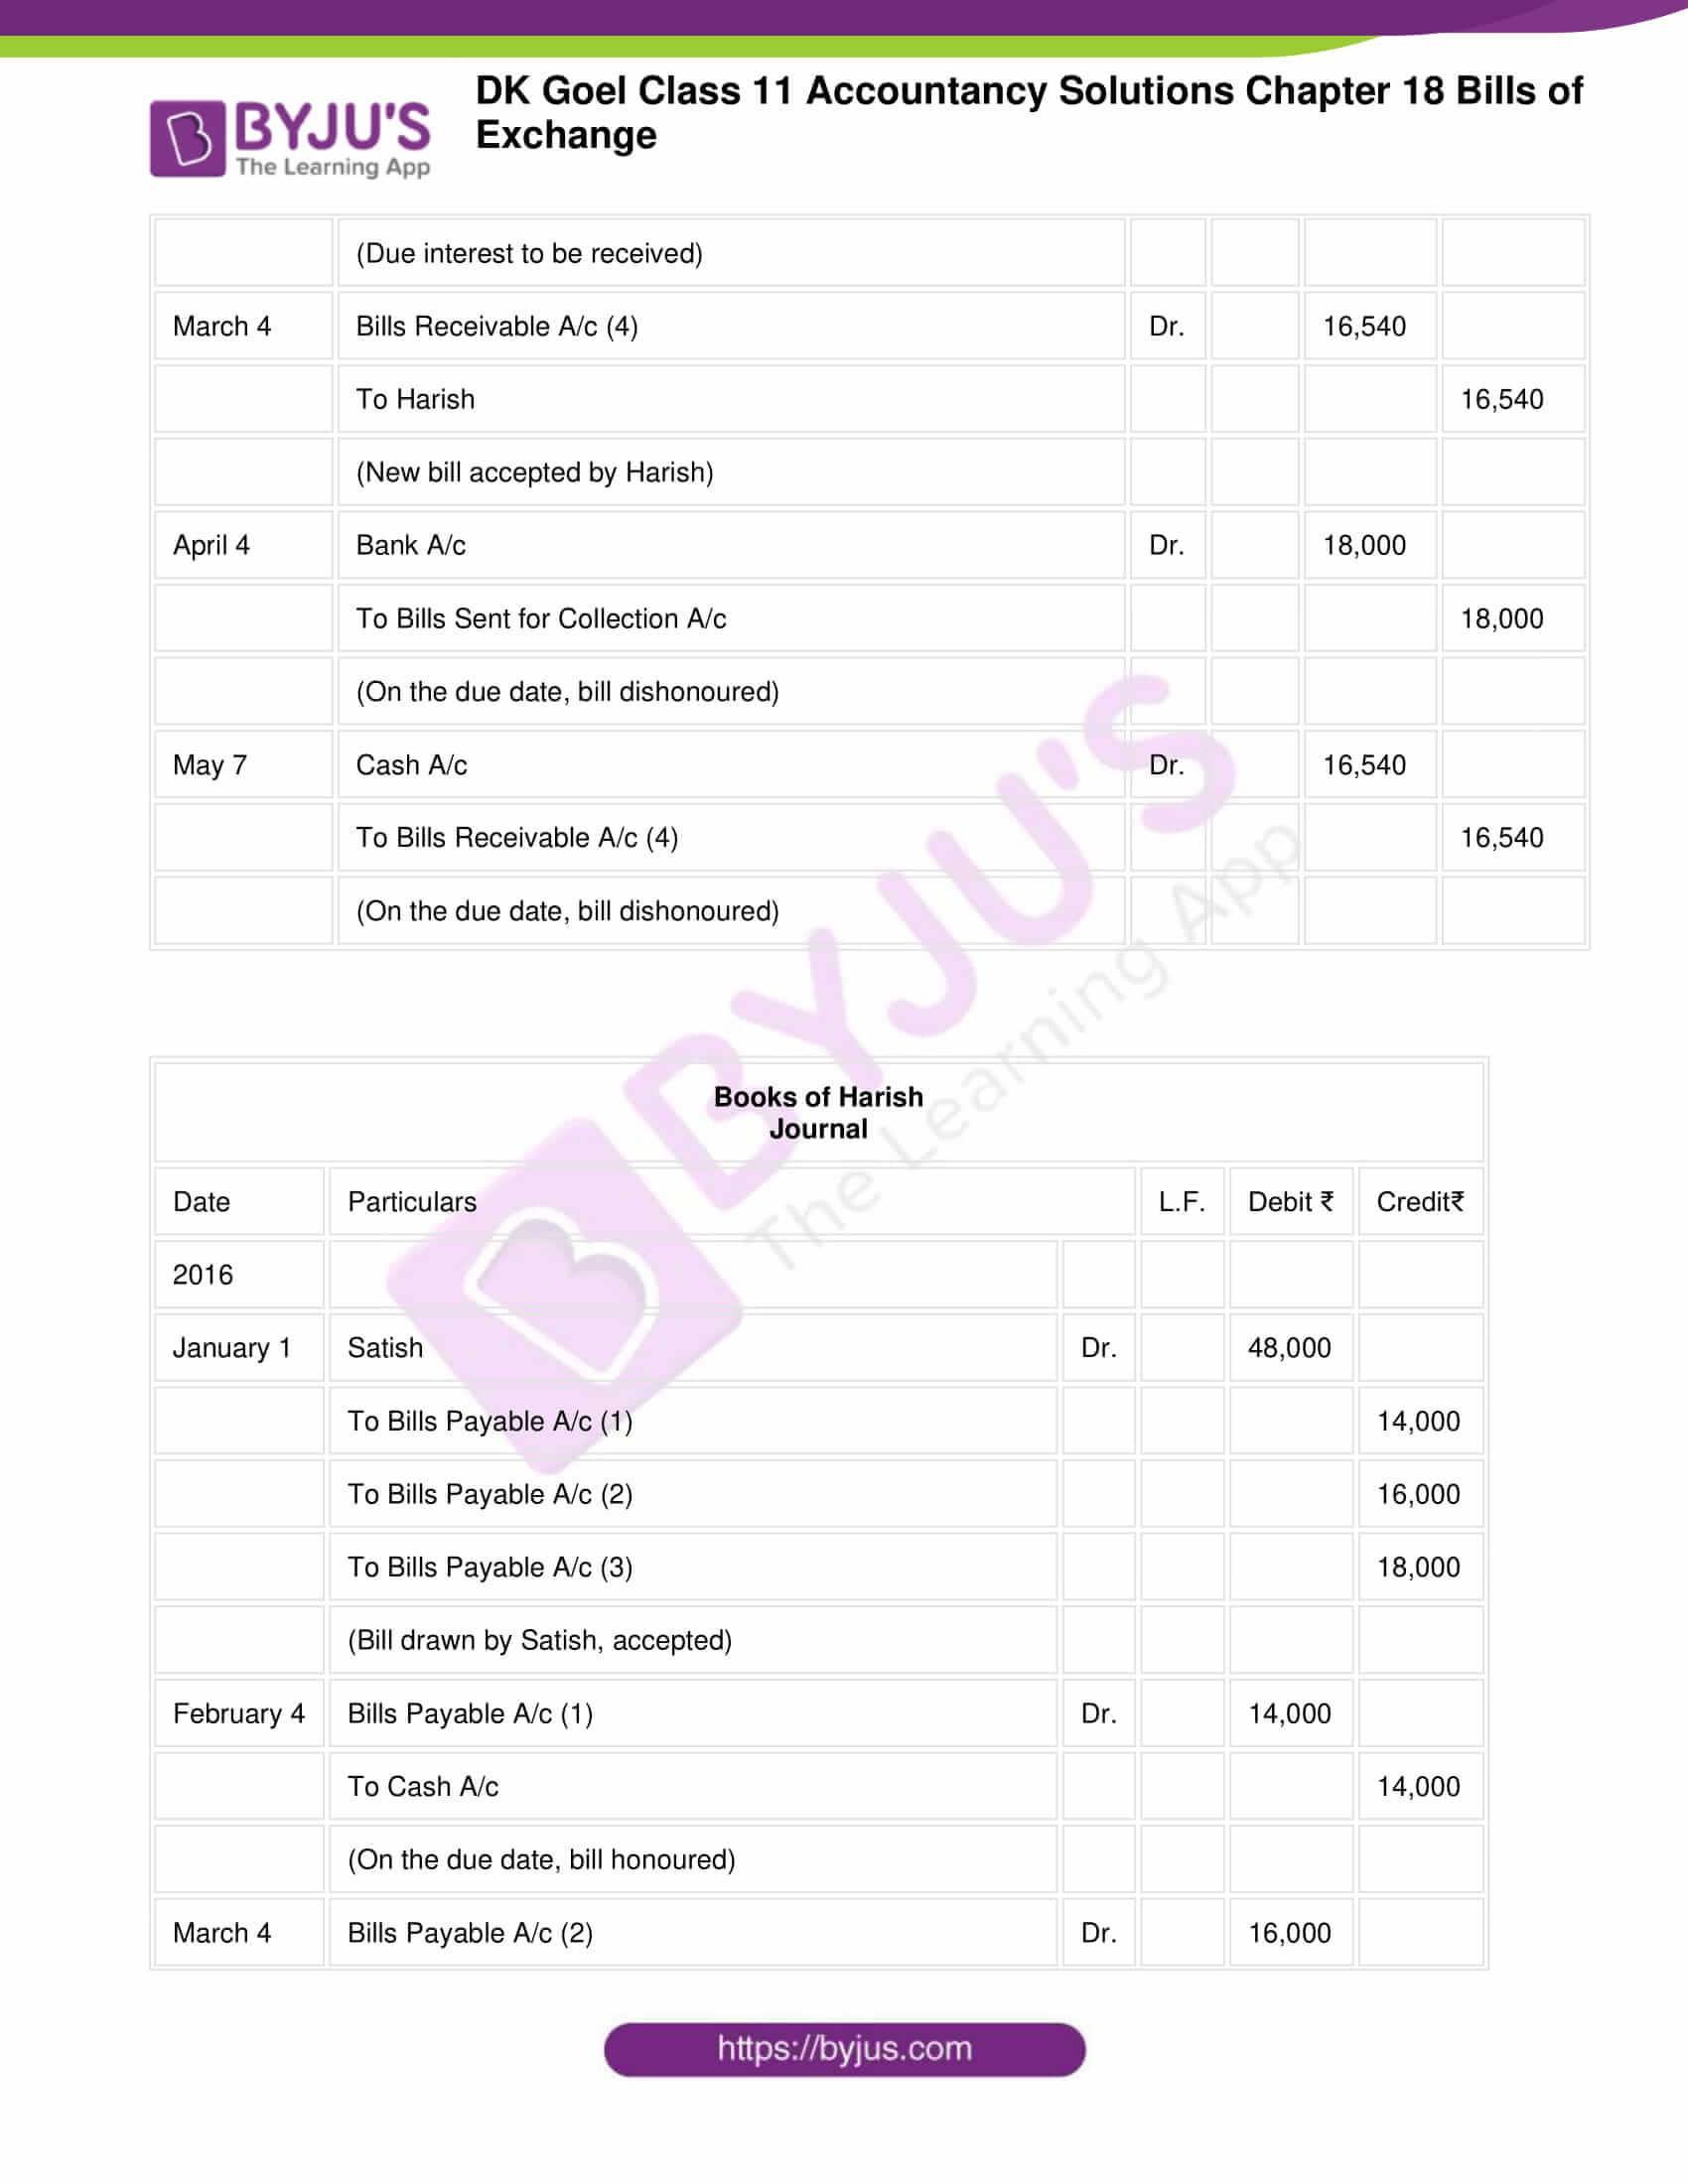 dk goel class 11 accountancy solutions chapter 18 074